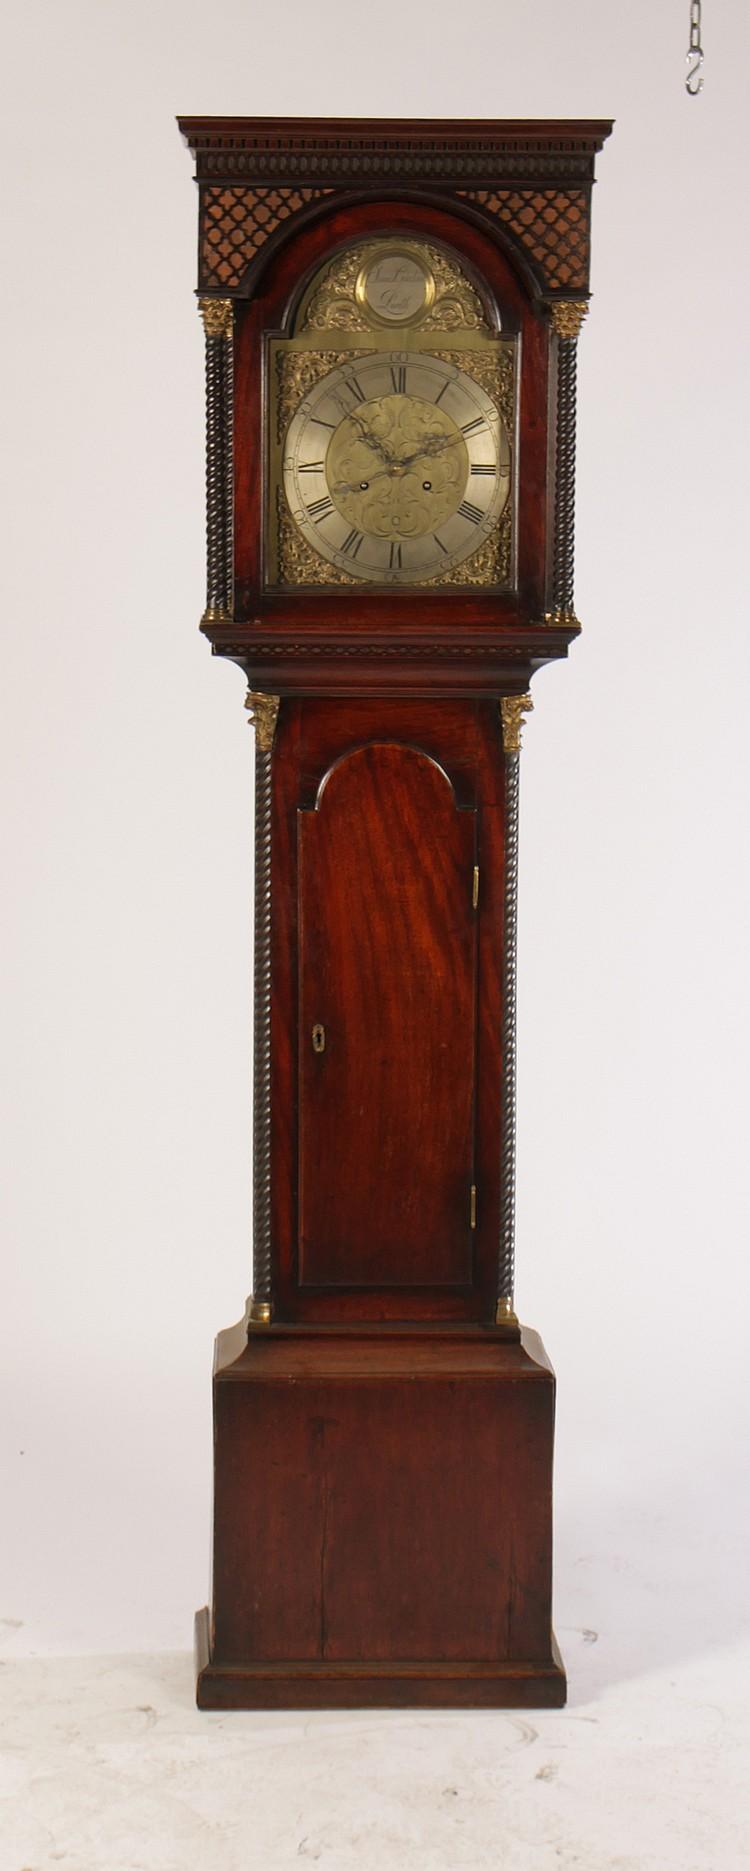 James gordon perth tall case clock circa 1880 Display home furniture auctions perth